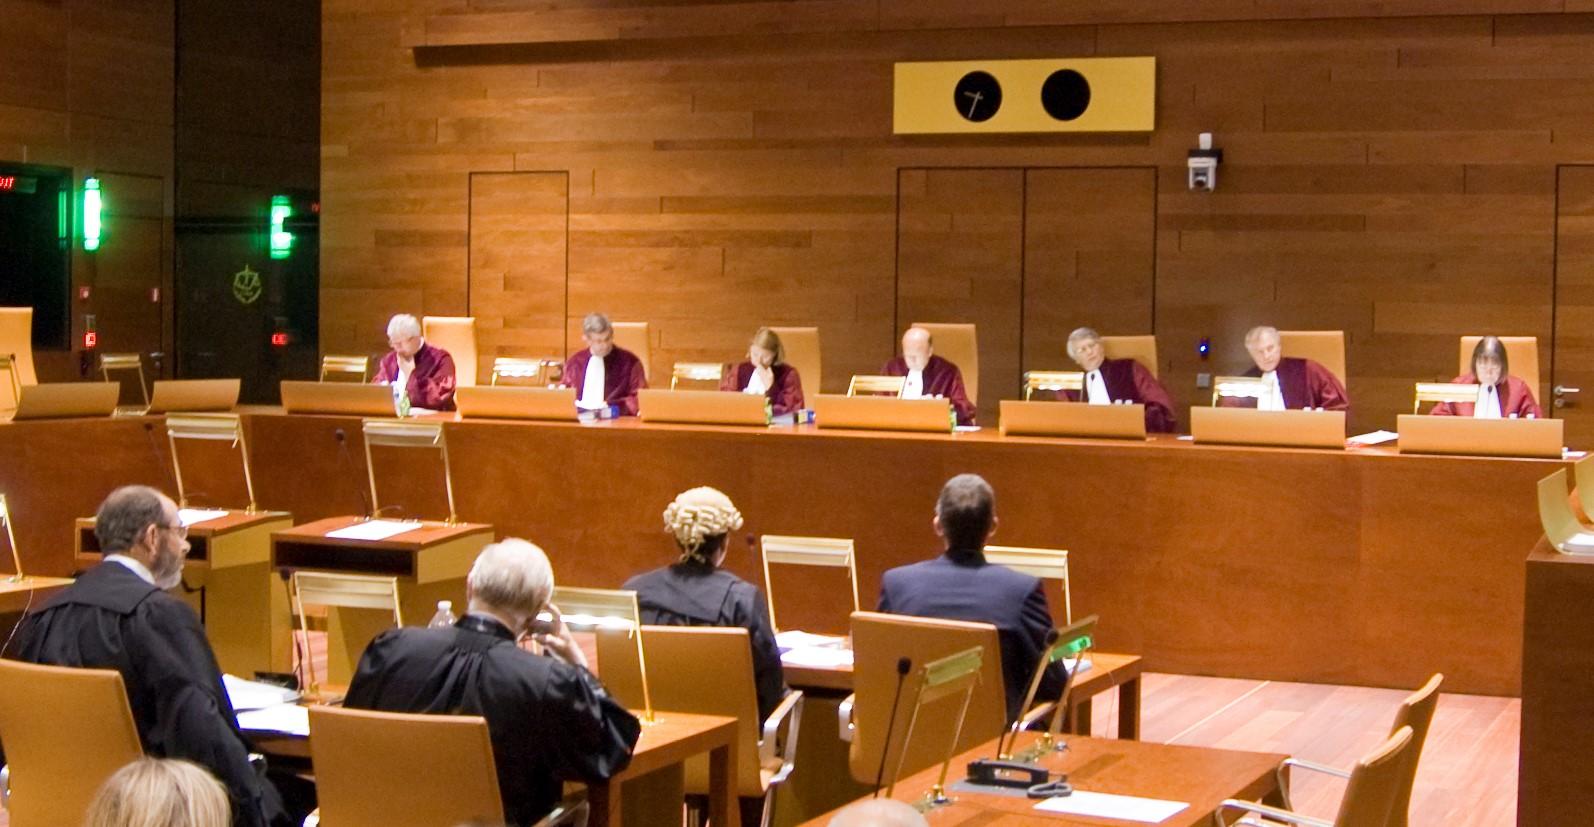 Anbud365: EU-domstolen avvisere begrensning av underleverandører i byggebransjen